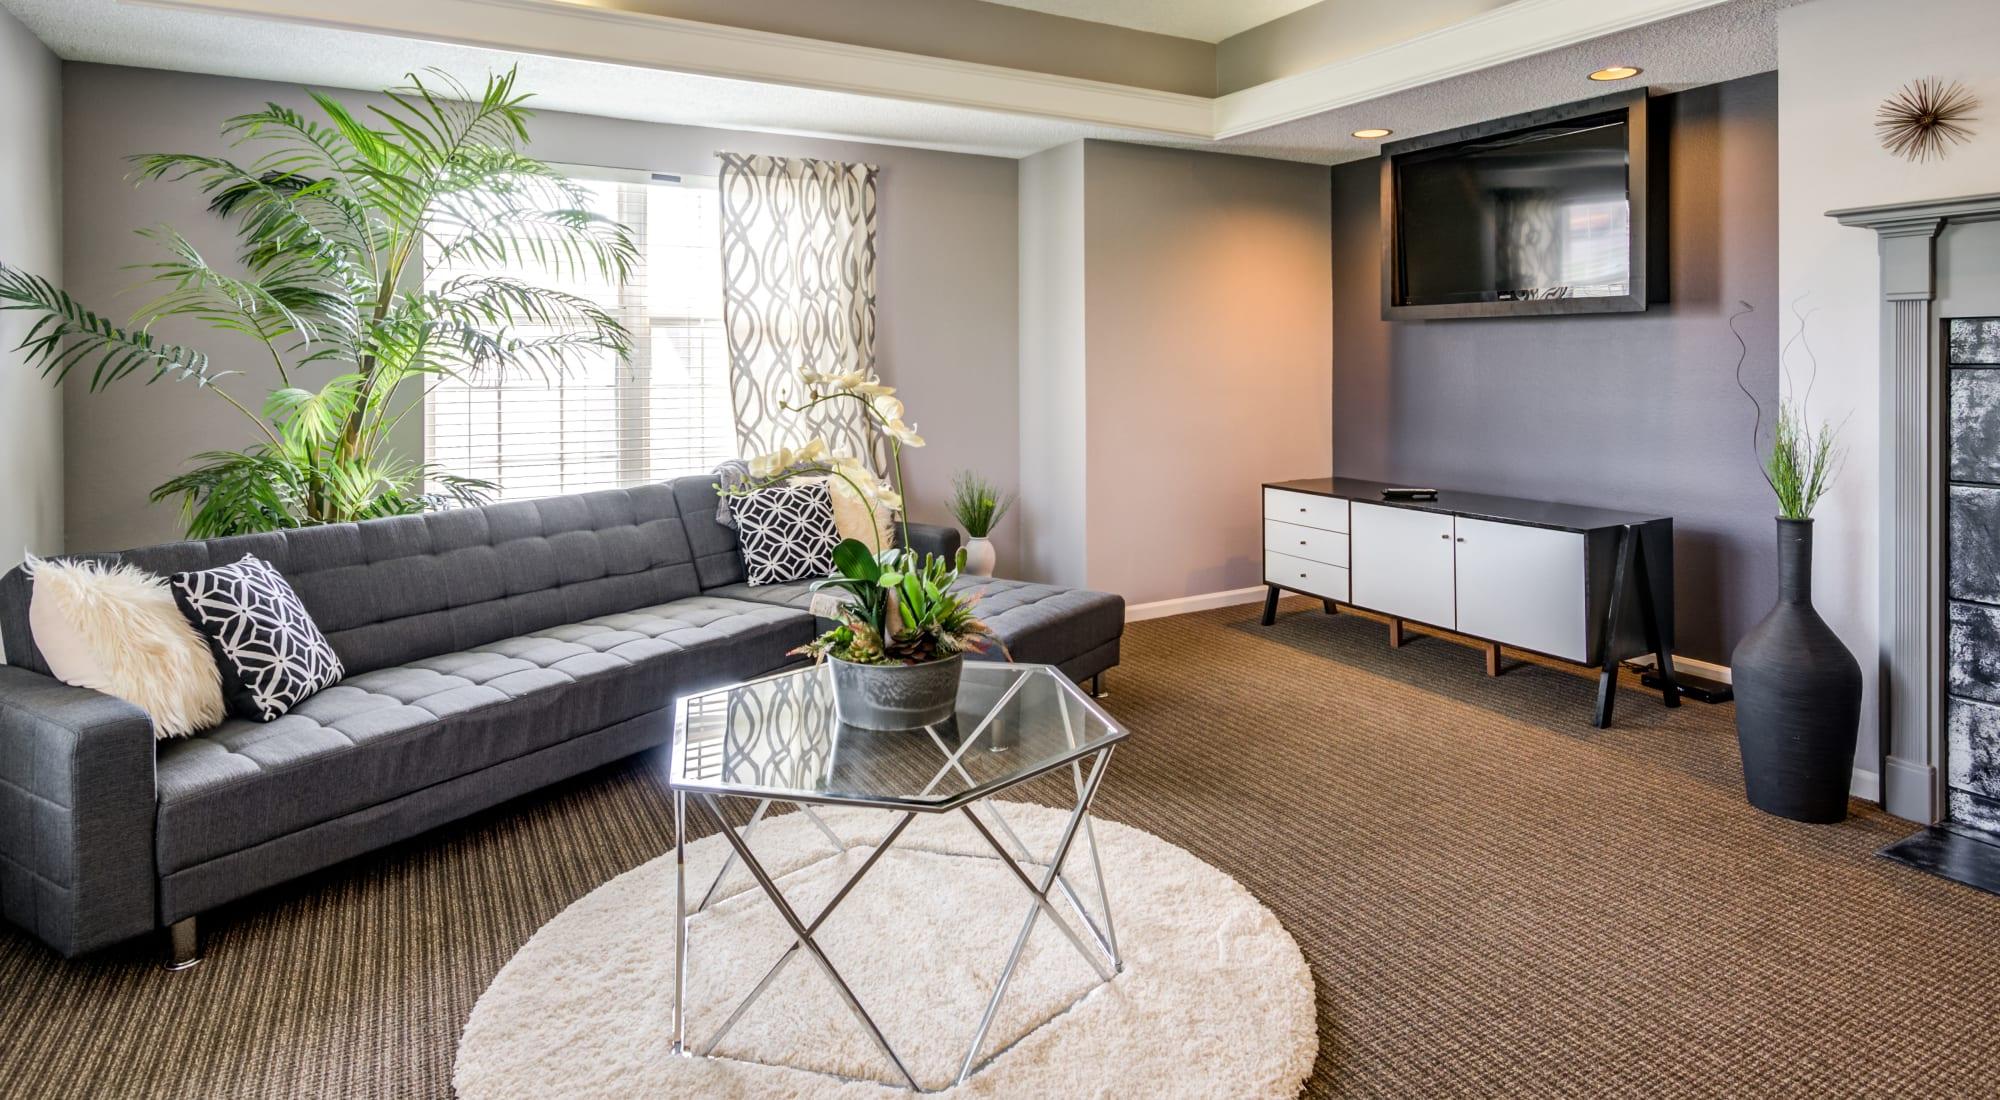 Reviews of Coach House Apartments in Kansas City, Missouri